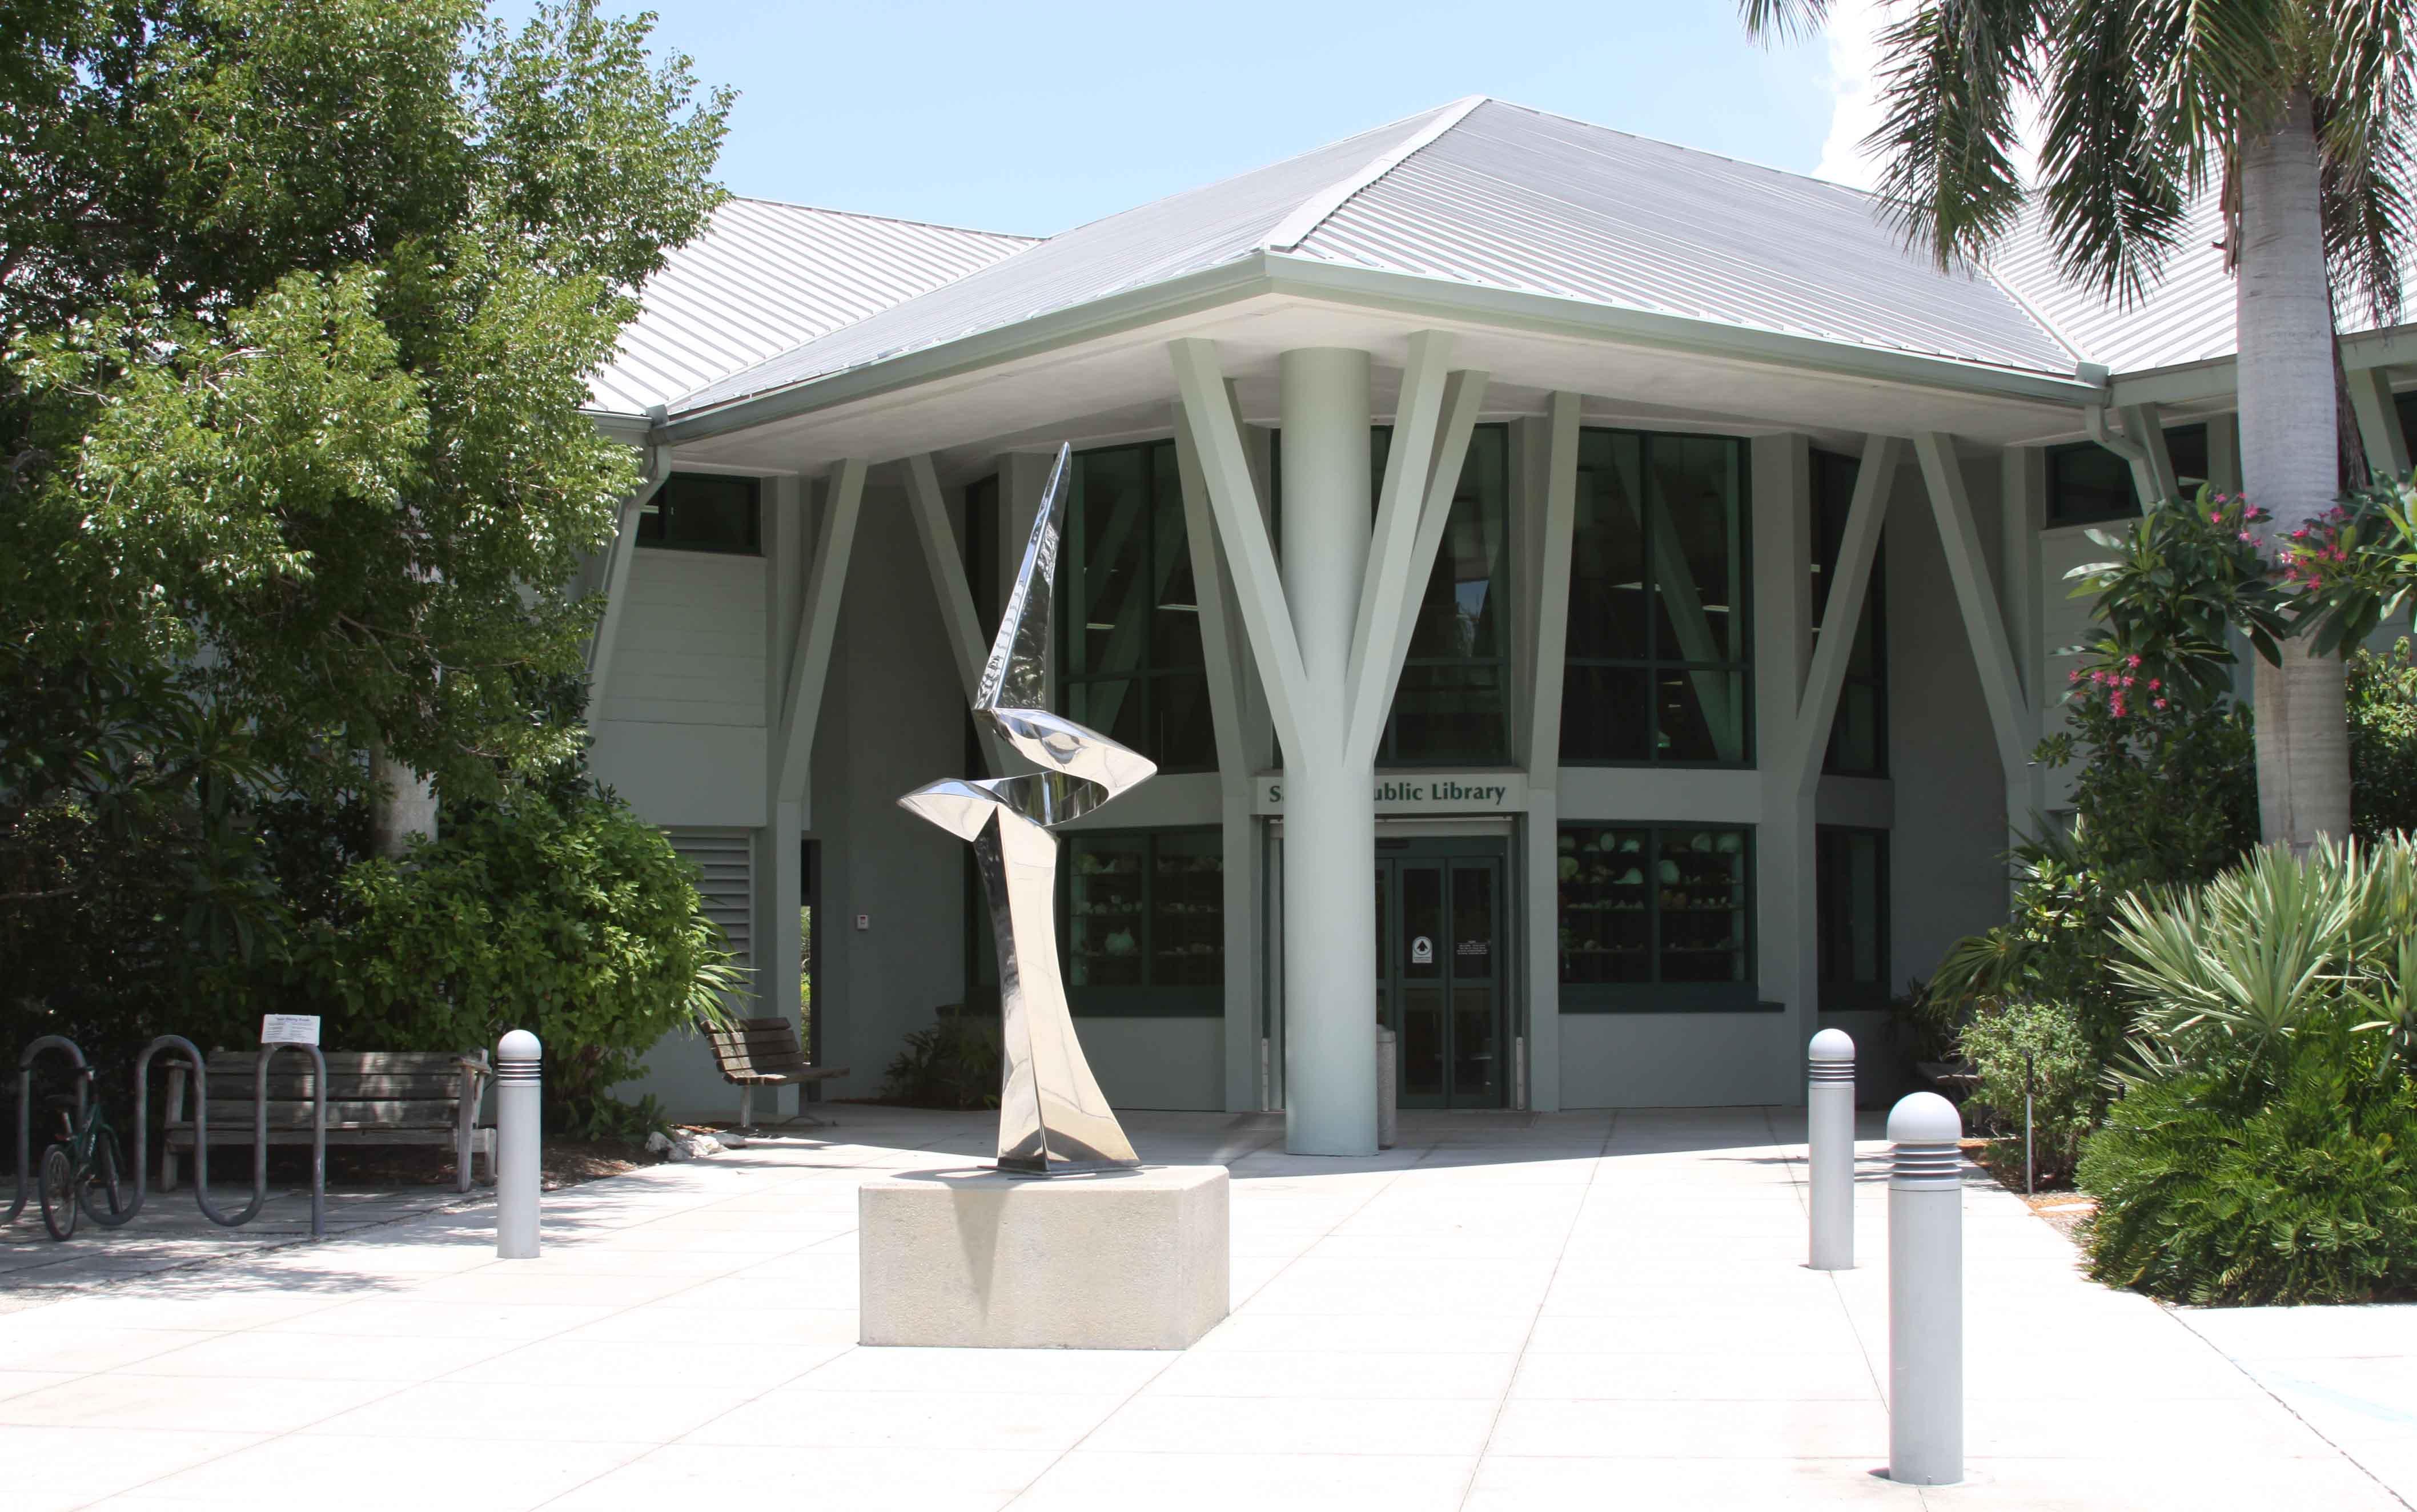 sanibel-library.jpg